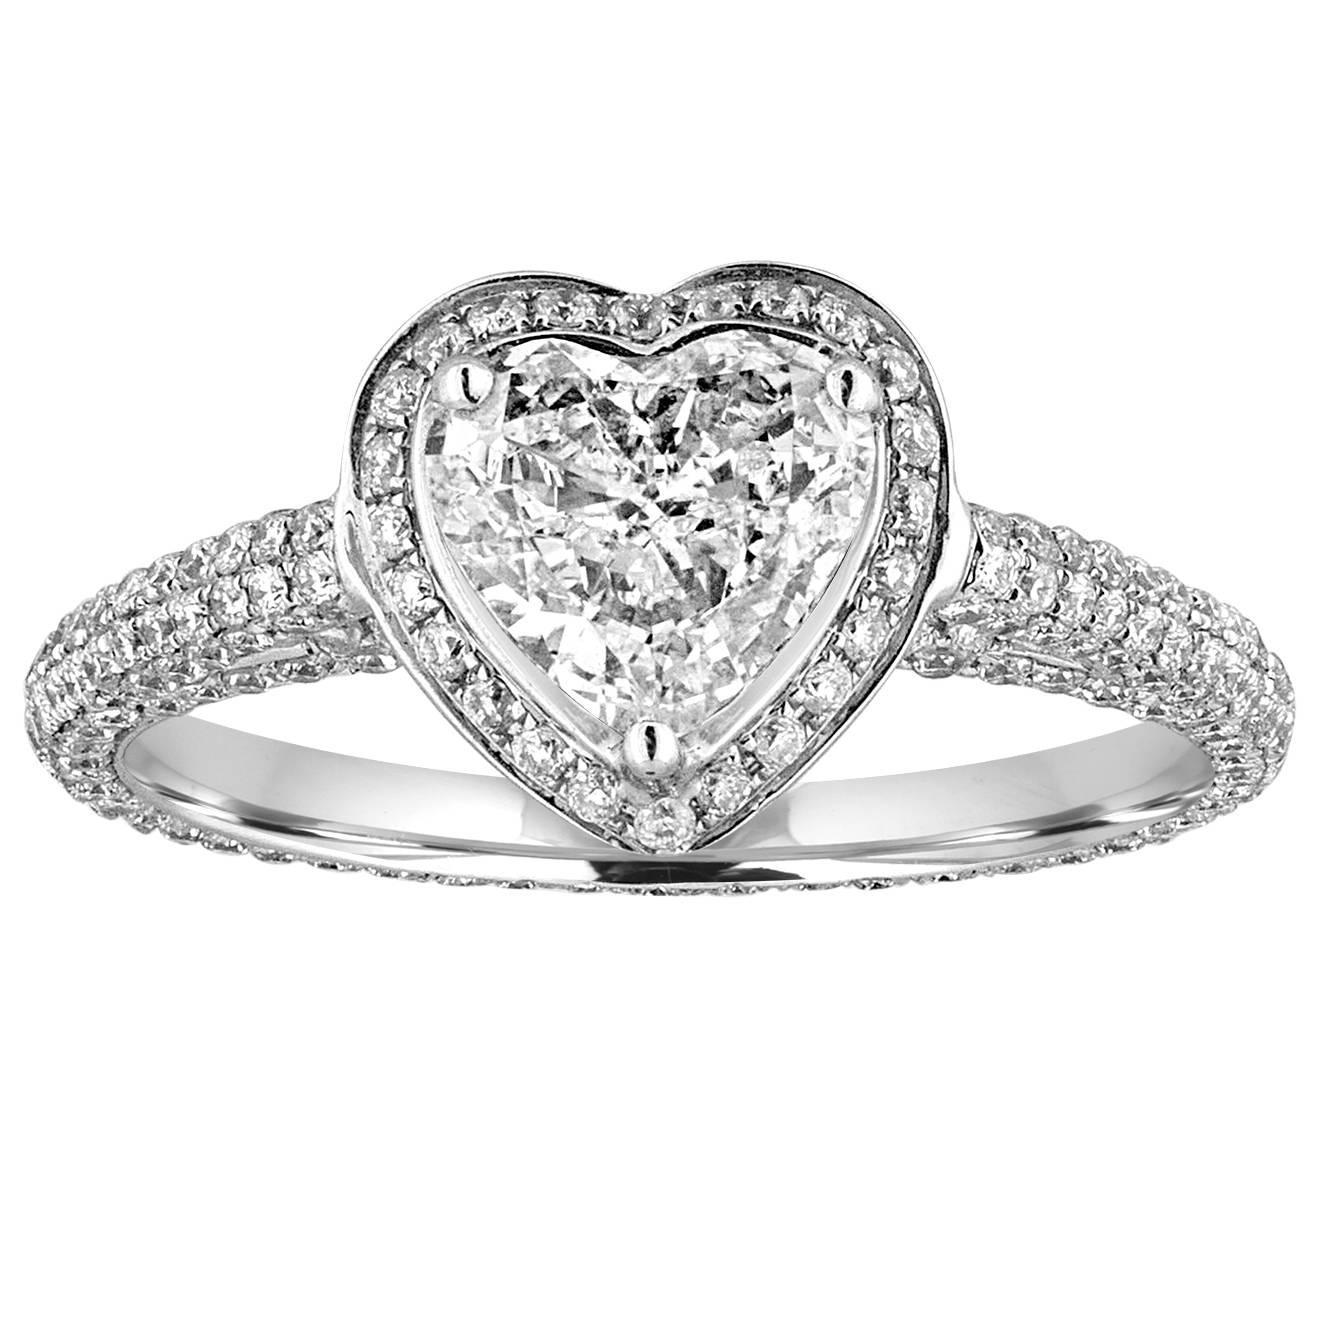 GIA Certified 0.82 Carat G VS1 Heart Shaped Diamond Engagement Ring